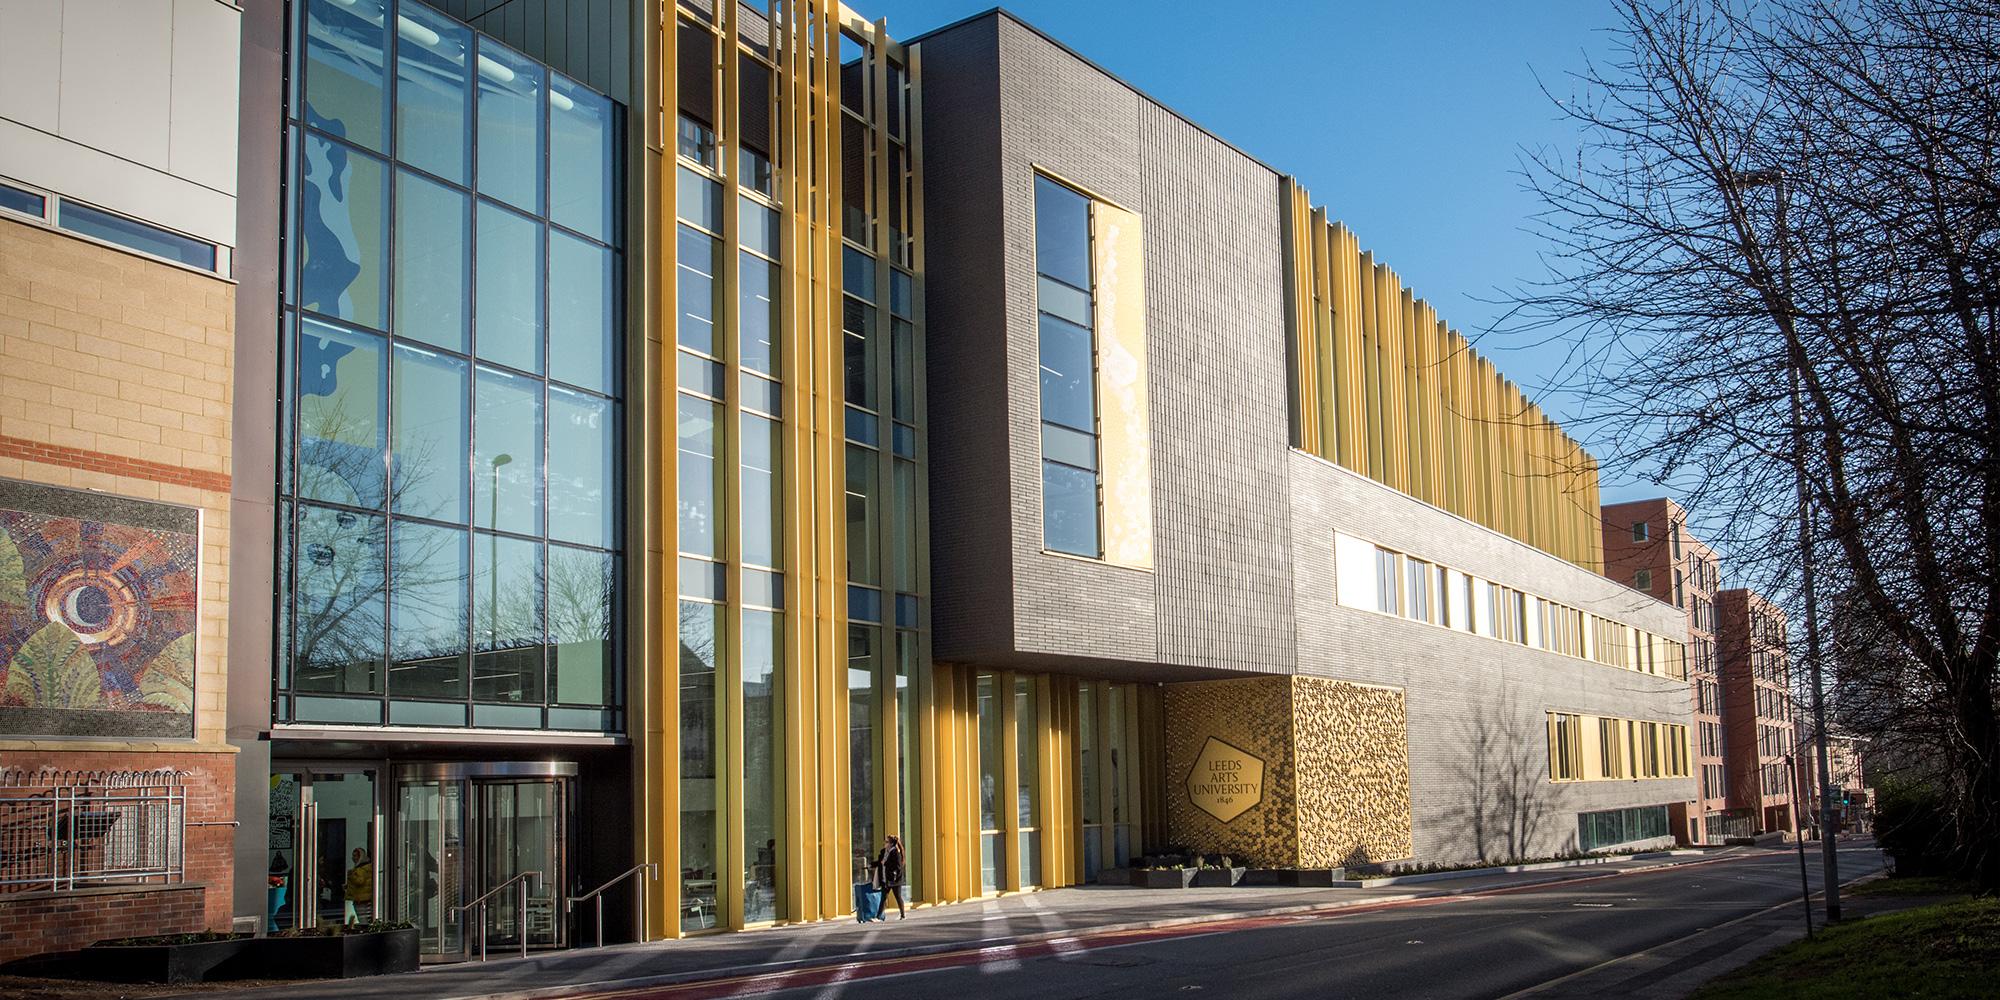 Leeds Arts University Case Studies Featured Image